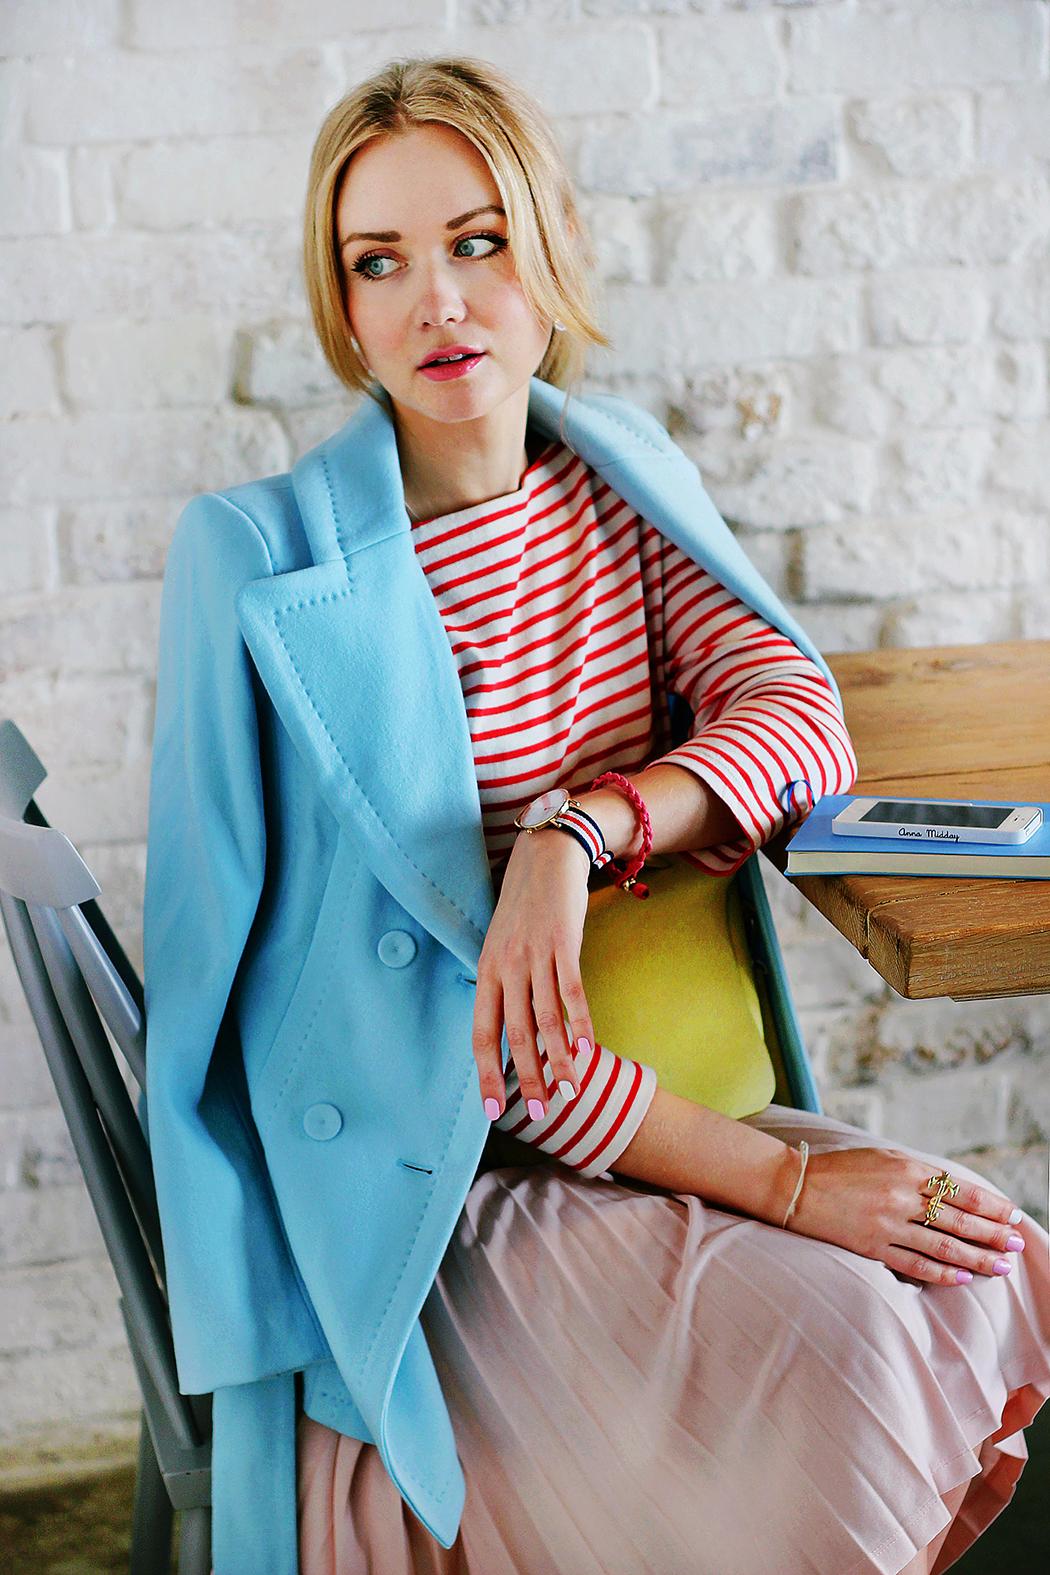 inspiration, pastel, marc cain, streetstyle, spring outfit, moscow fashion week, annamidday, top fashion blogger, top russian fashion blogger, фэшн блогер, русский блогер, известный блогер, топовый блогер, russian bloger, top russian blogger, streetfashion, russian fashion blogger, blogger, fashion, style, fashionista, модный блогер, российский блогер, ТОП блогер, ootd, lookoftheday, look, популярный блогер, российский модный блогер, russian girl, с чем носить пастельное пальто, французский стиль, girly, pastel coat, красивая девушка, русская девушка, fashion week, MBFW, Moscow Fashion Week 2015, Mercedes-Benz Fashion Week, SS 15 trends, spring 2015 trends